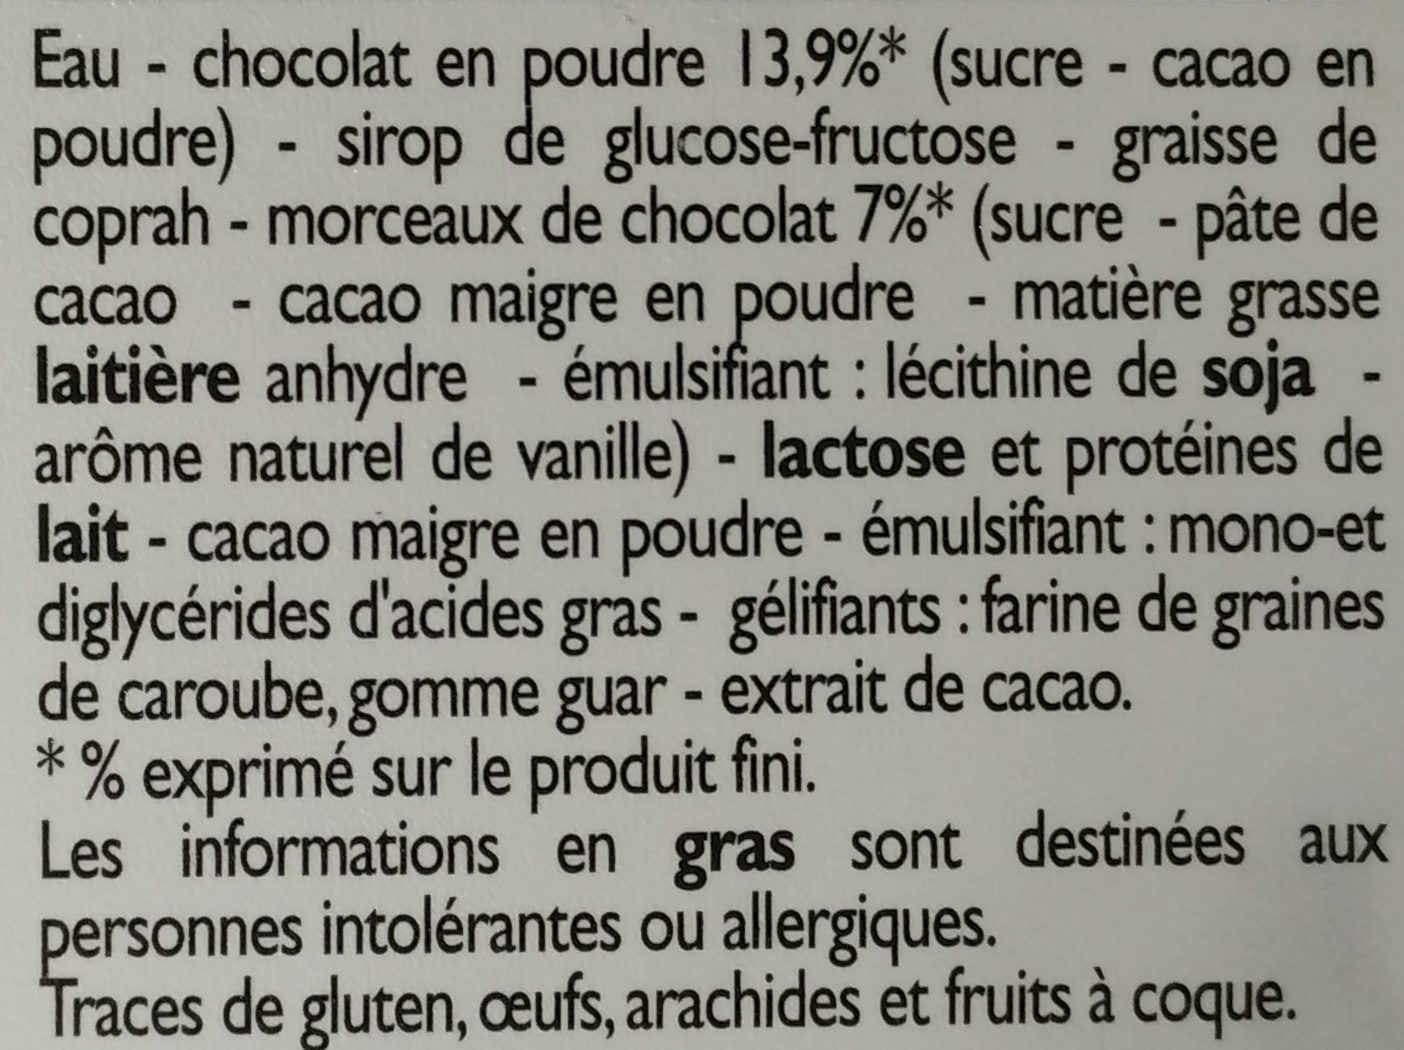 Bac Mono Price >> Glace Chocolat aux Pépites de Chocolat - Leader Price - 495 g